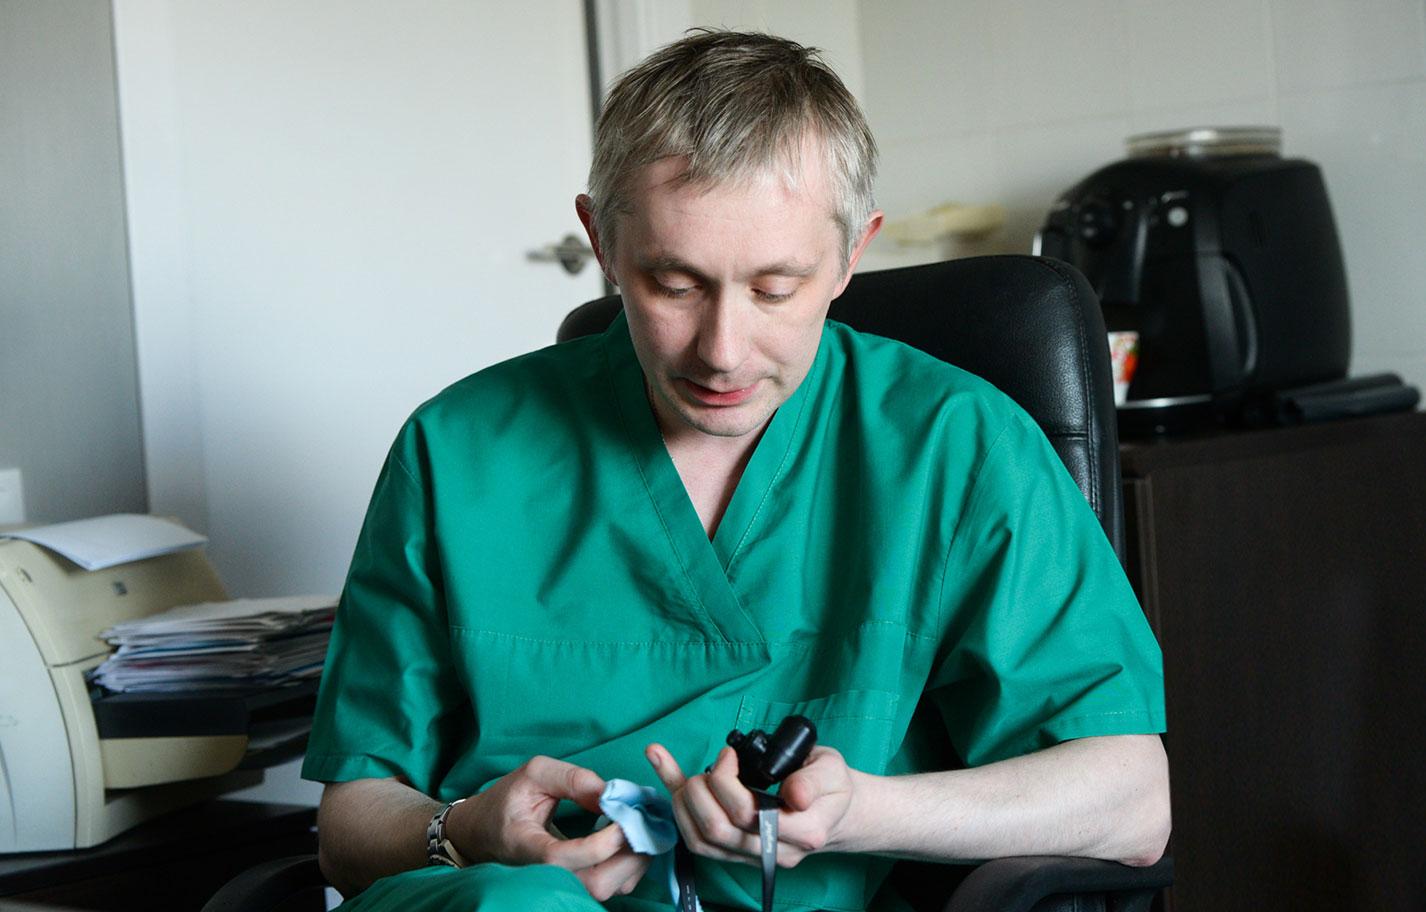 В год Константин Казанцев выполняет от 170 до 200 операций